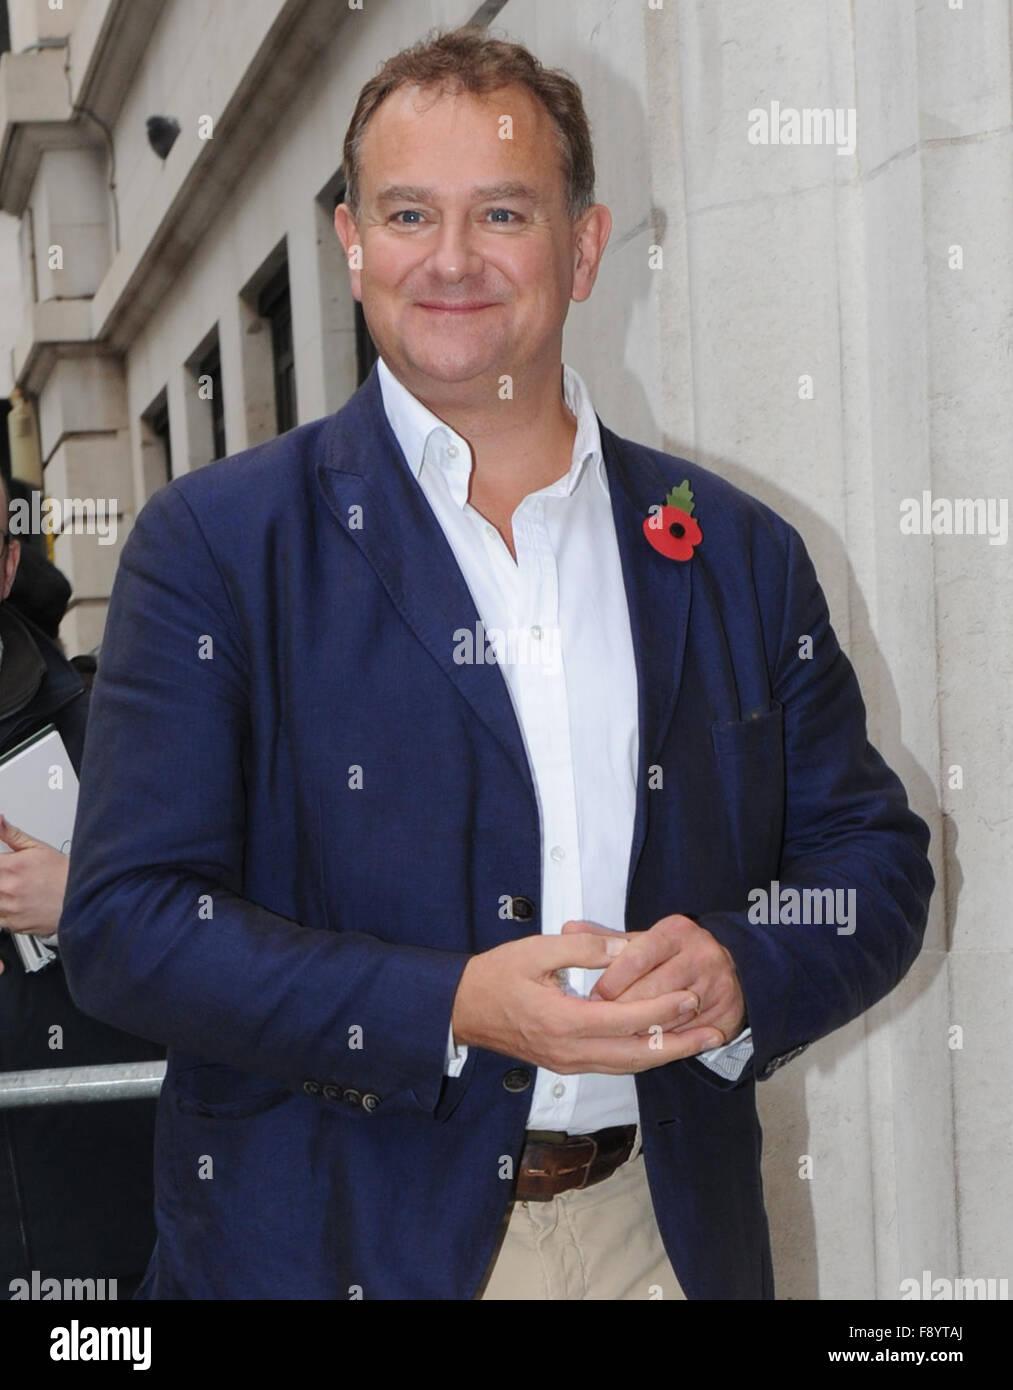 Hugh Bonneville at BBC Radio 2 studios in London  Featuring: Hugh Bonneville Where: London, United Kingdom When: - Stock Image